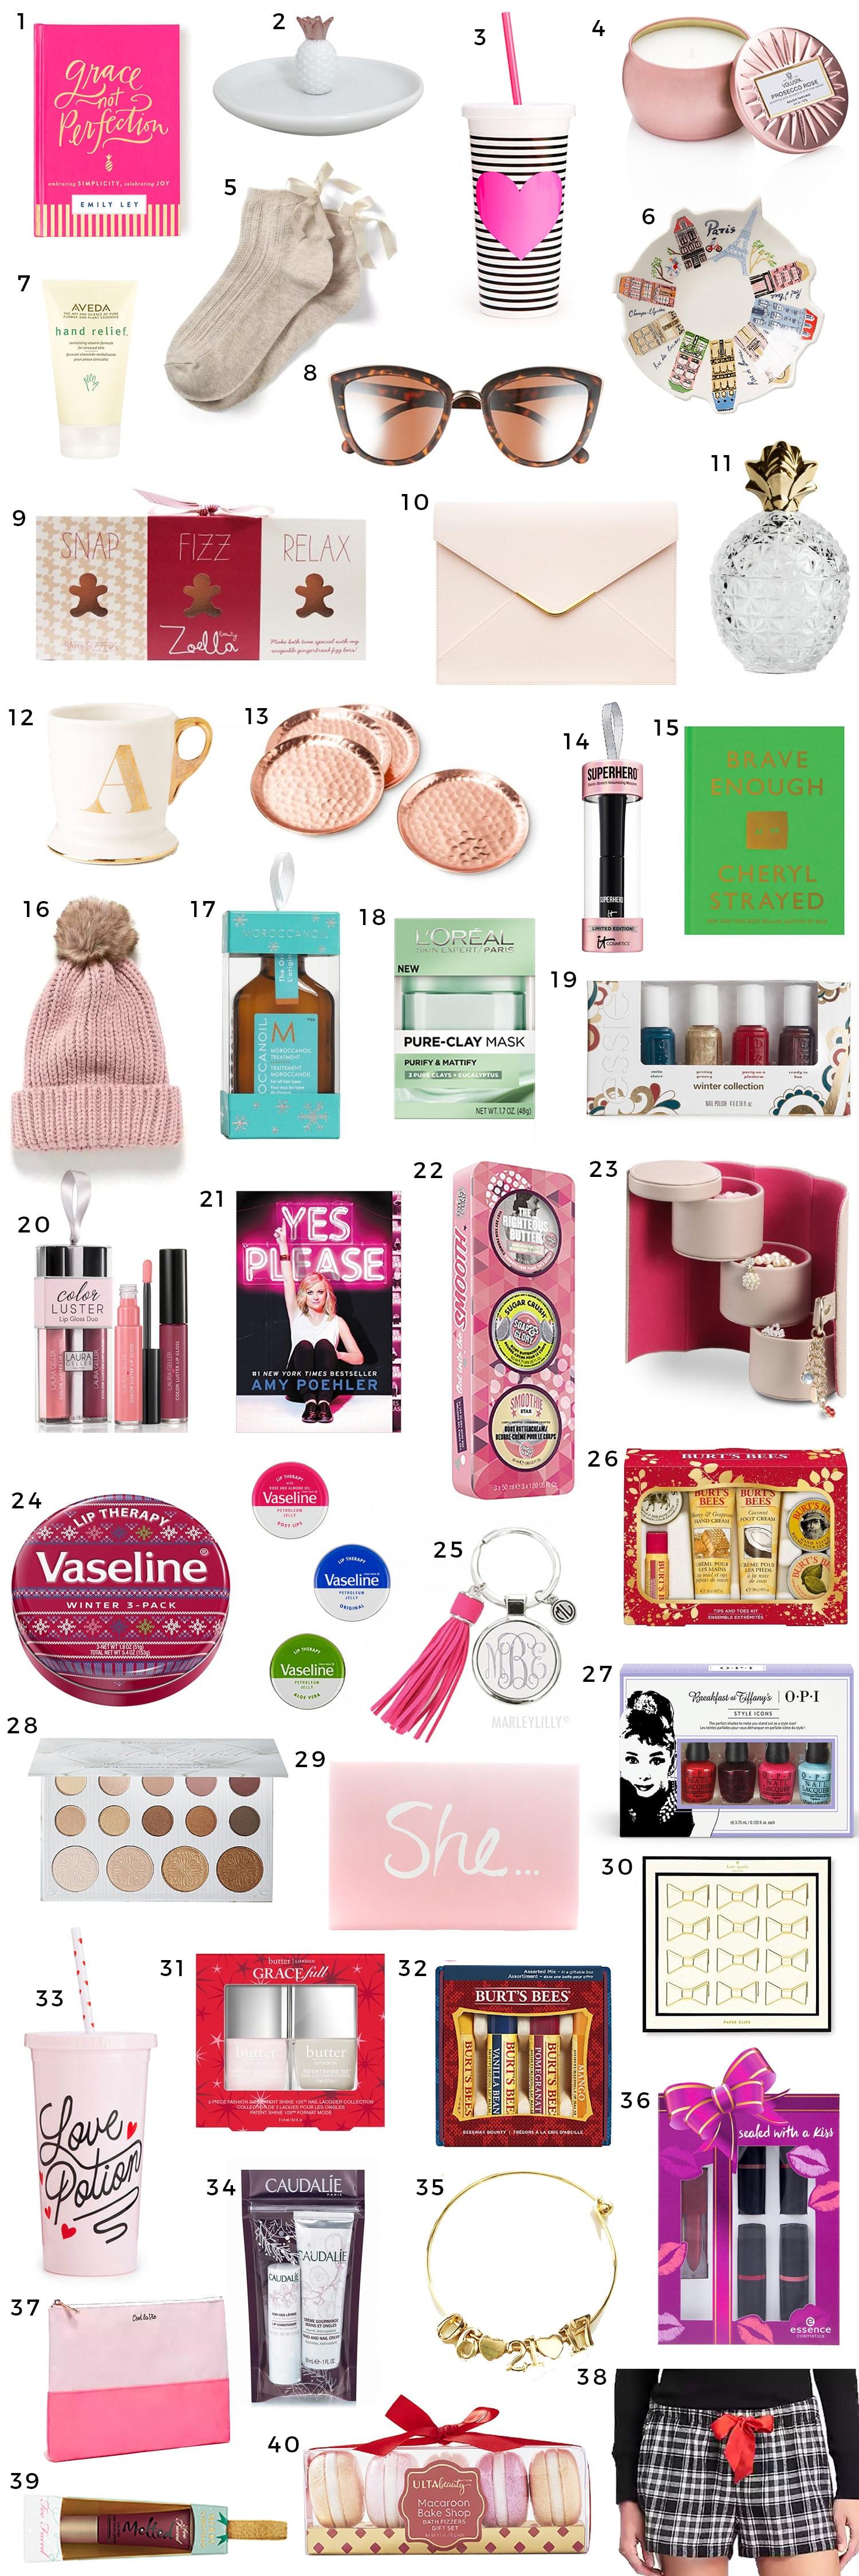 Christmas Gift Ideas For Women  The Best Christmas Gift Ideas for Women Under $15